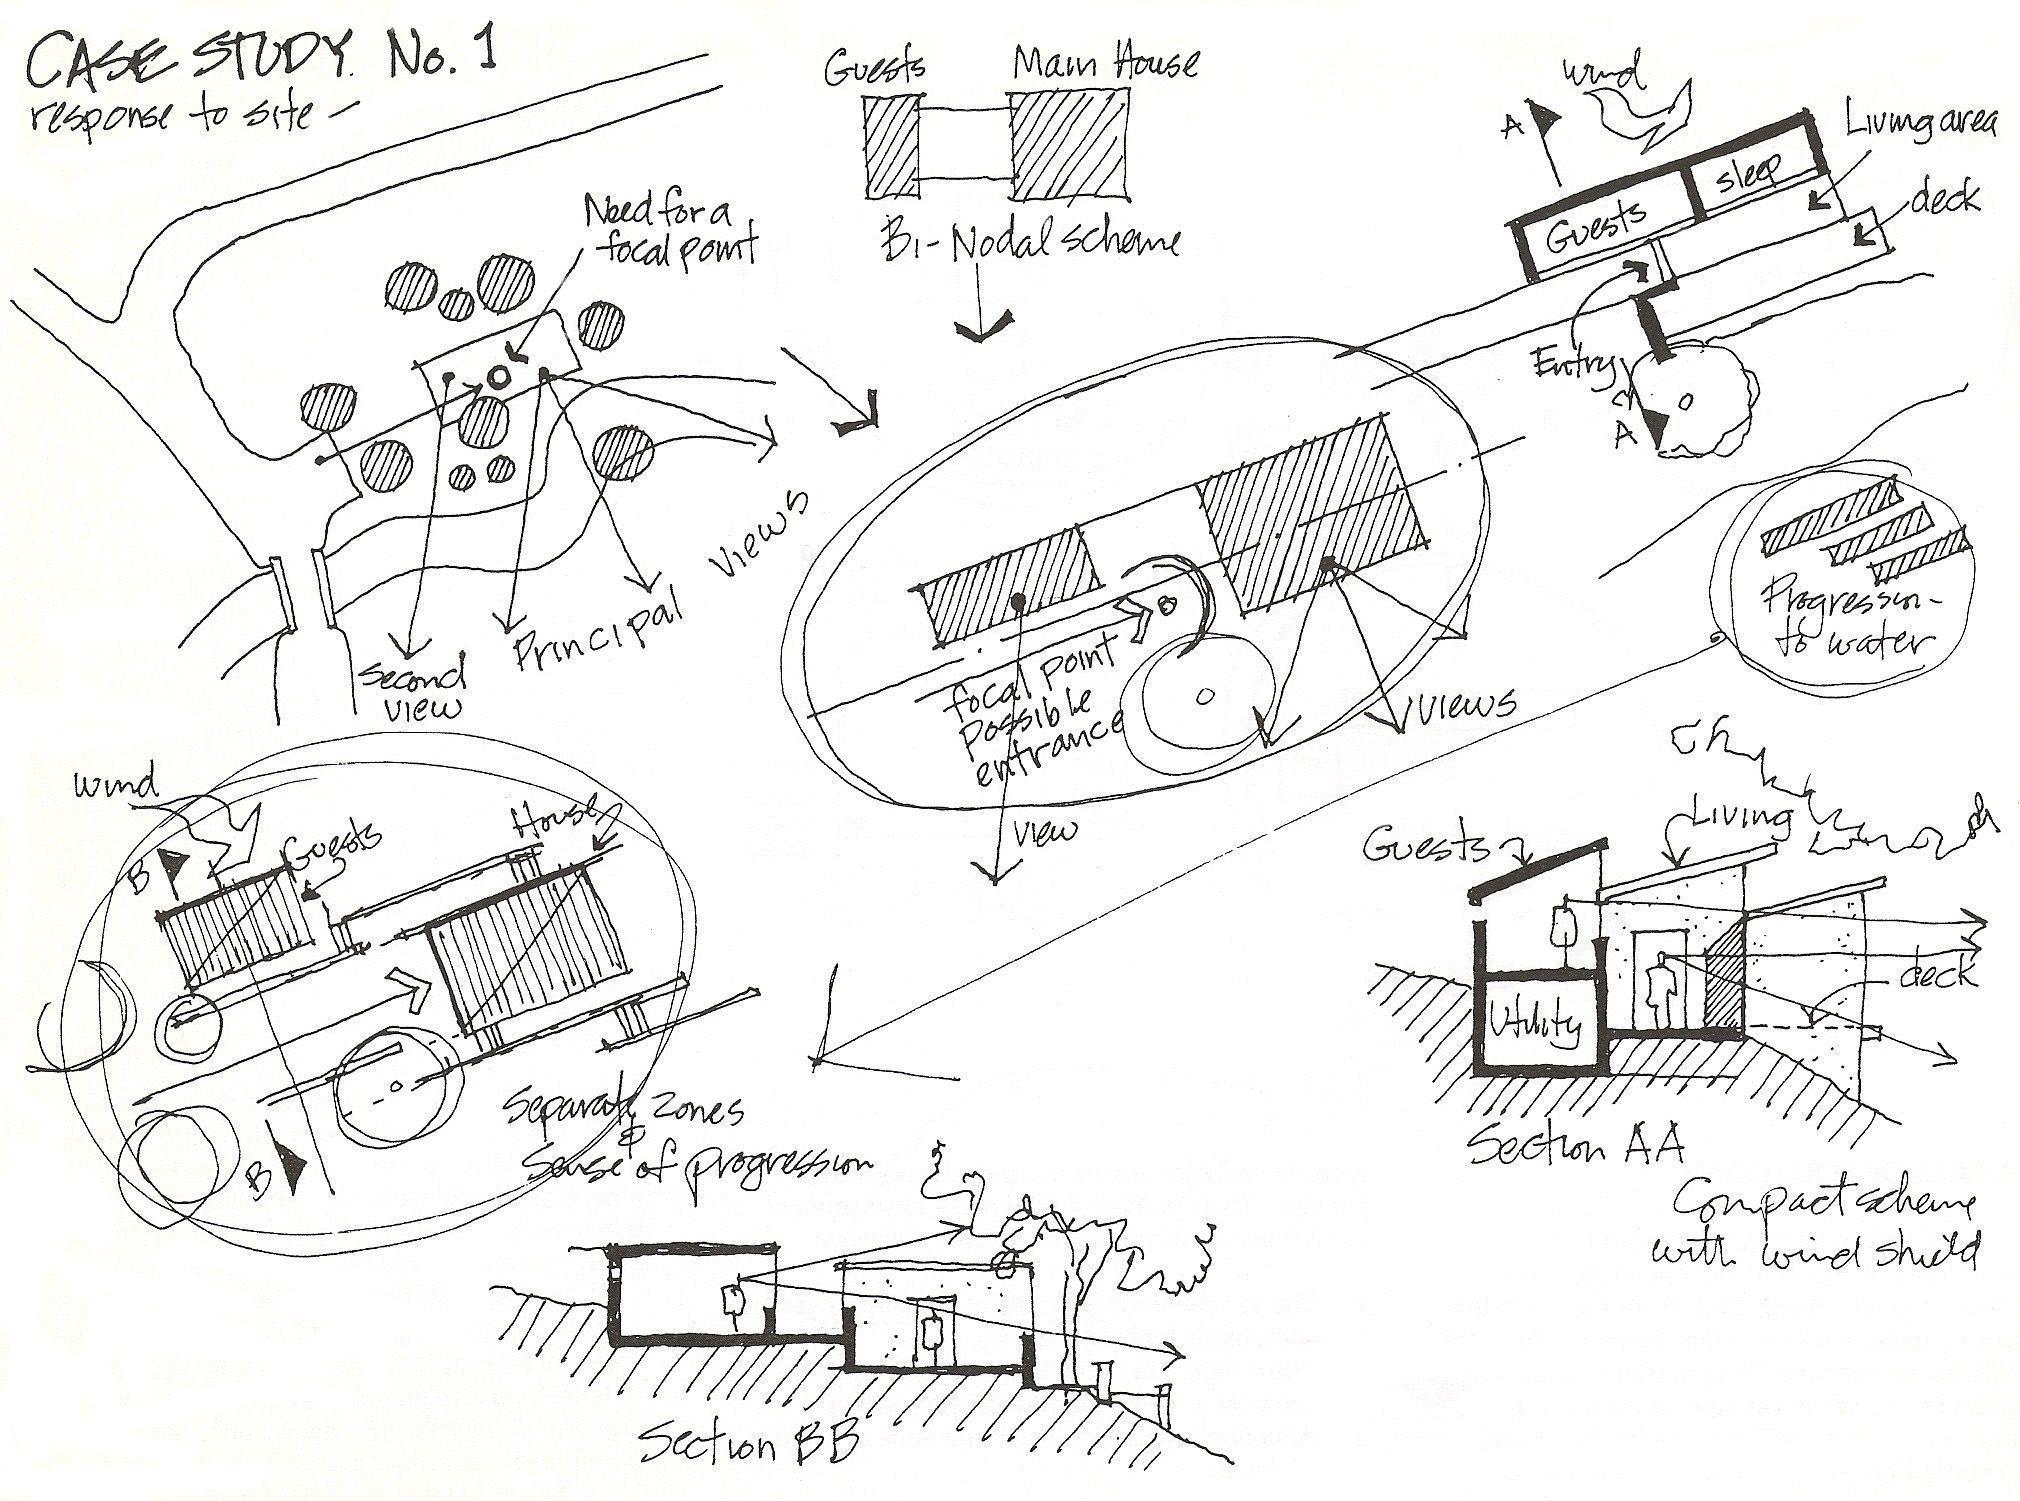 Conceptdiagram Urbanplanning In